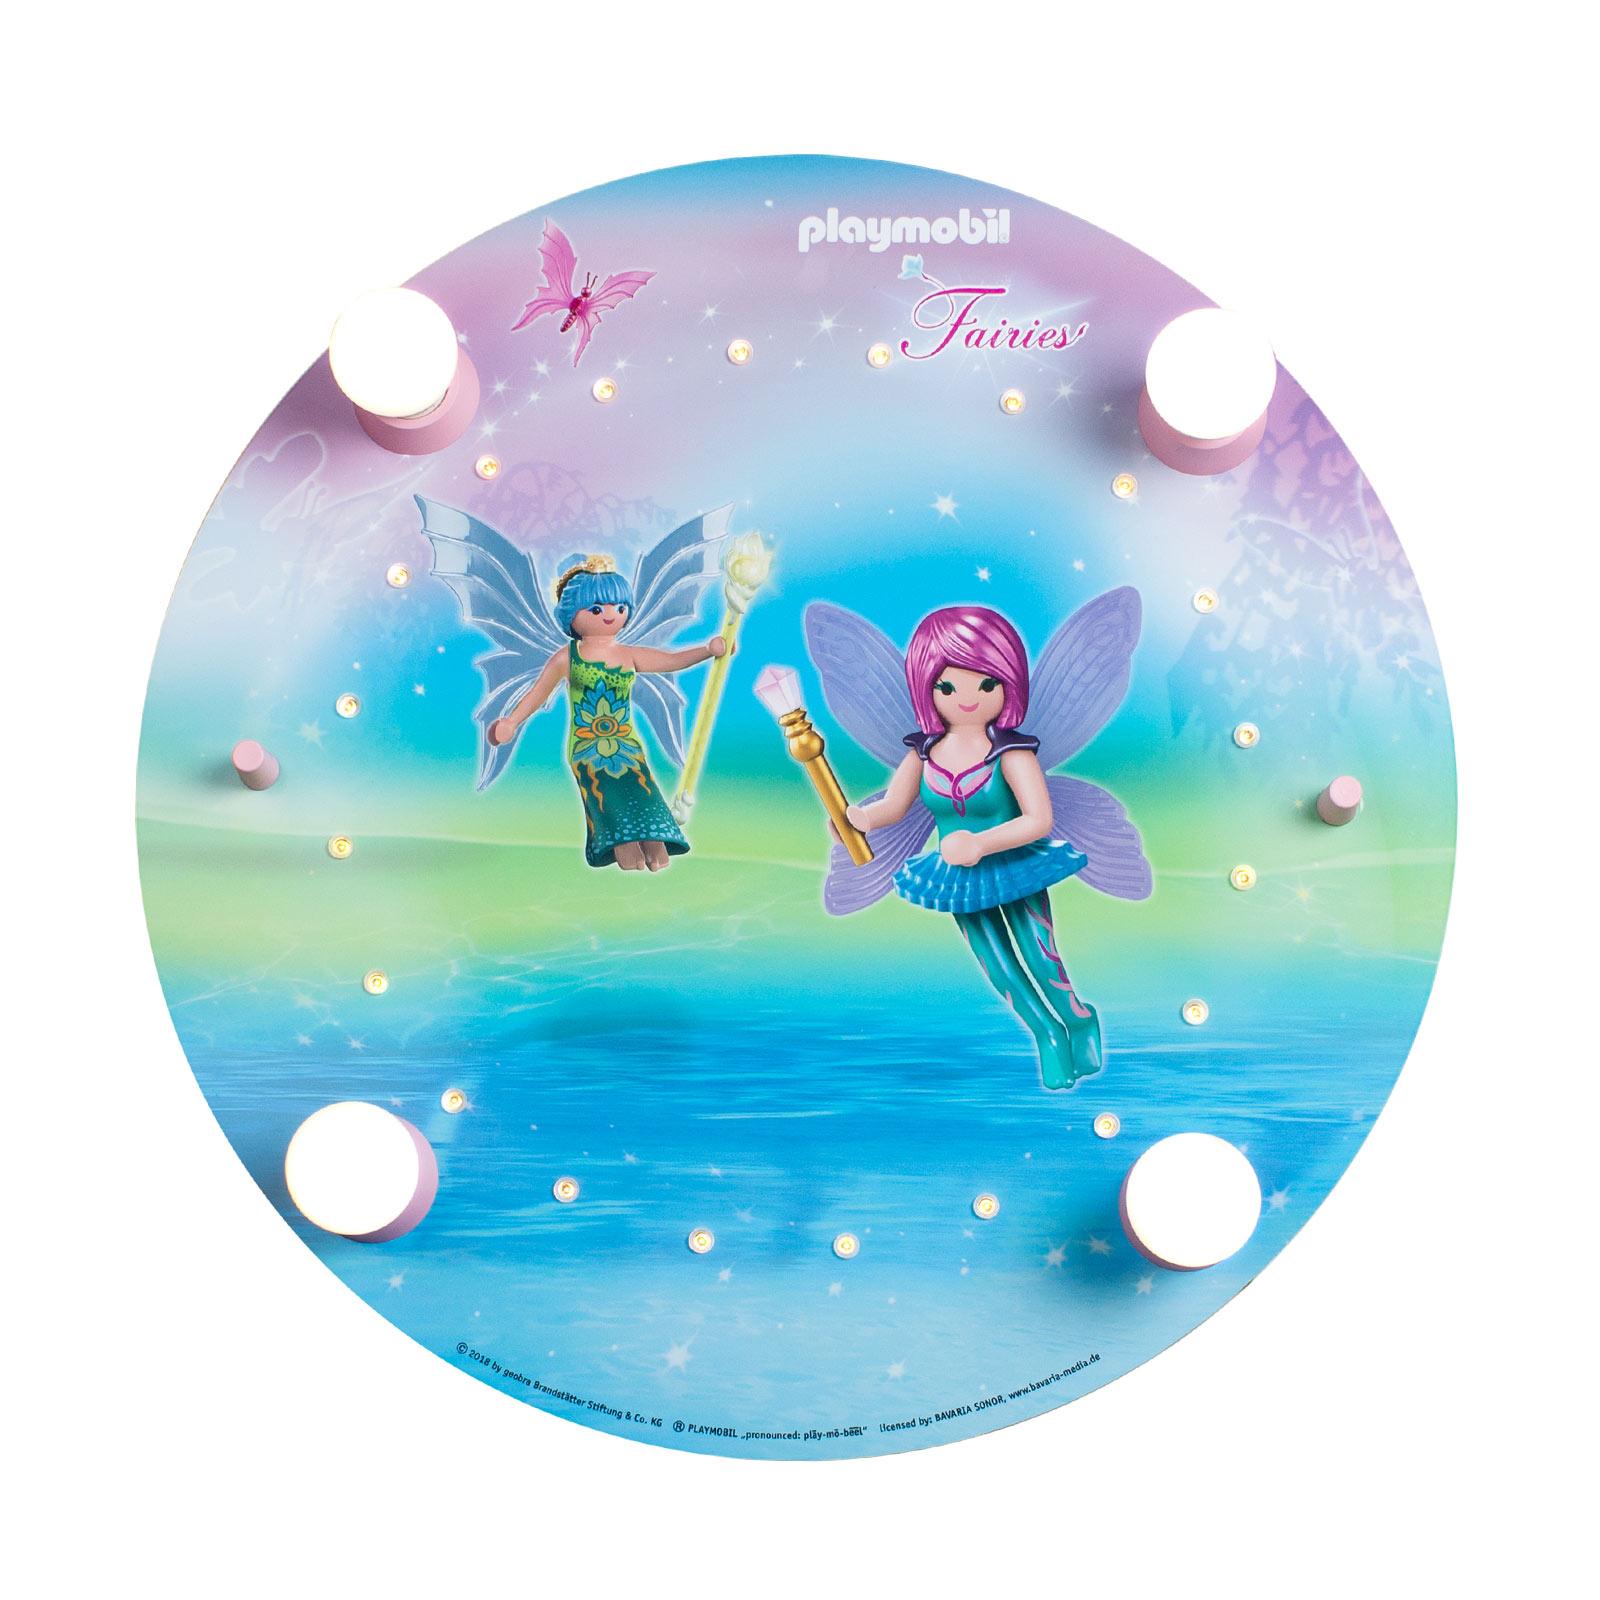 Lampa sufitowa okrągła PLAYMOBIL Fairies